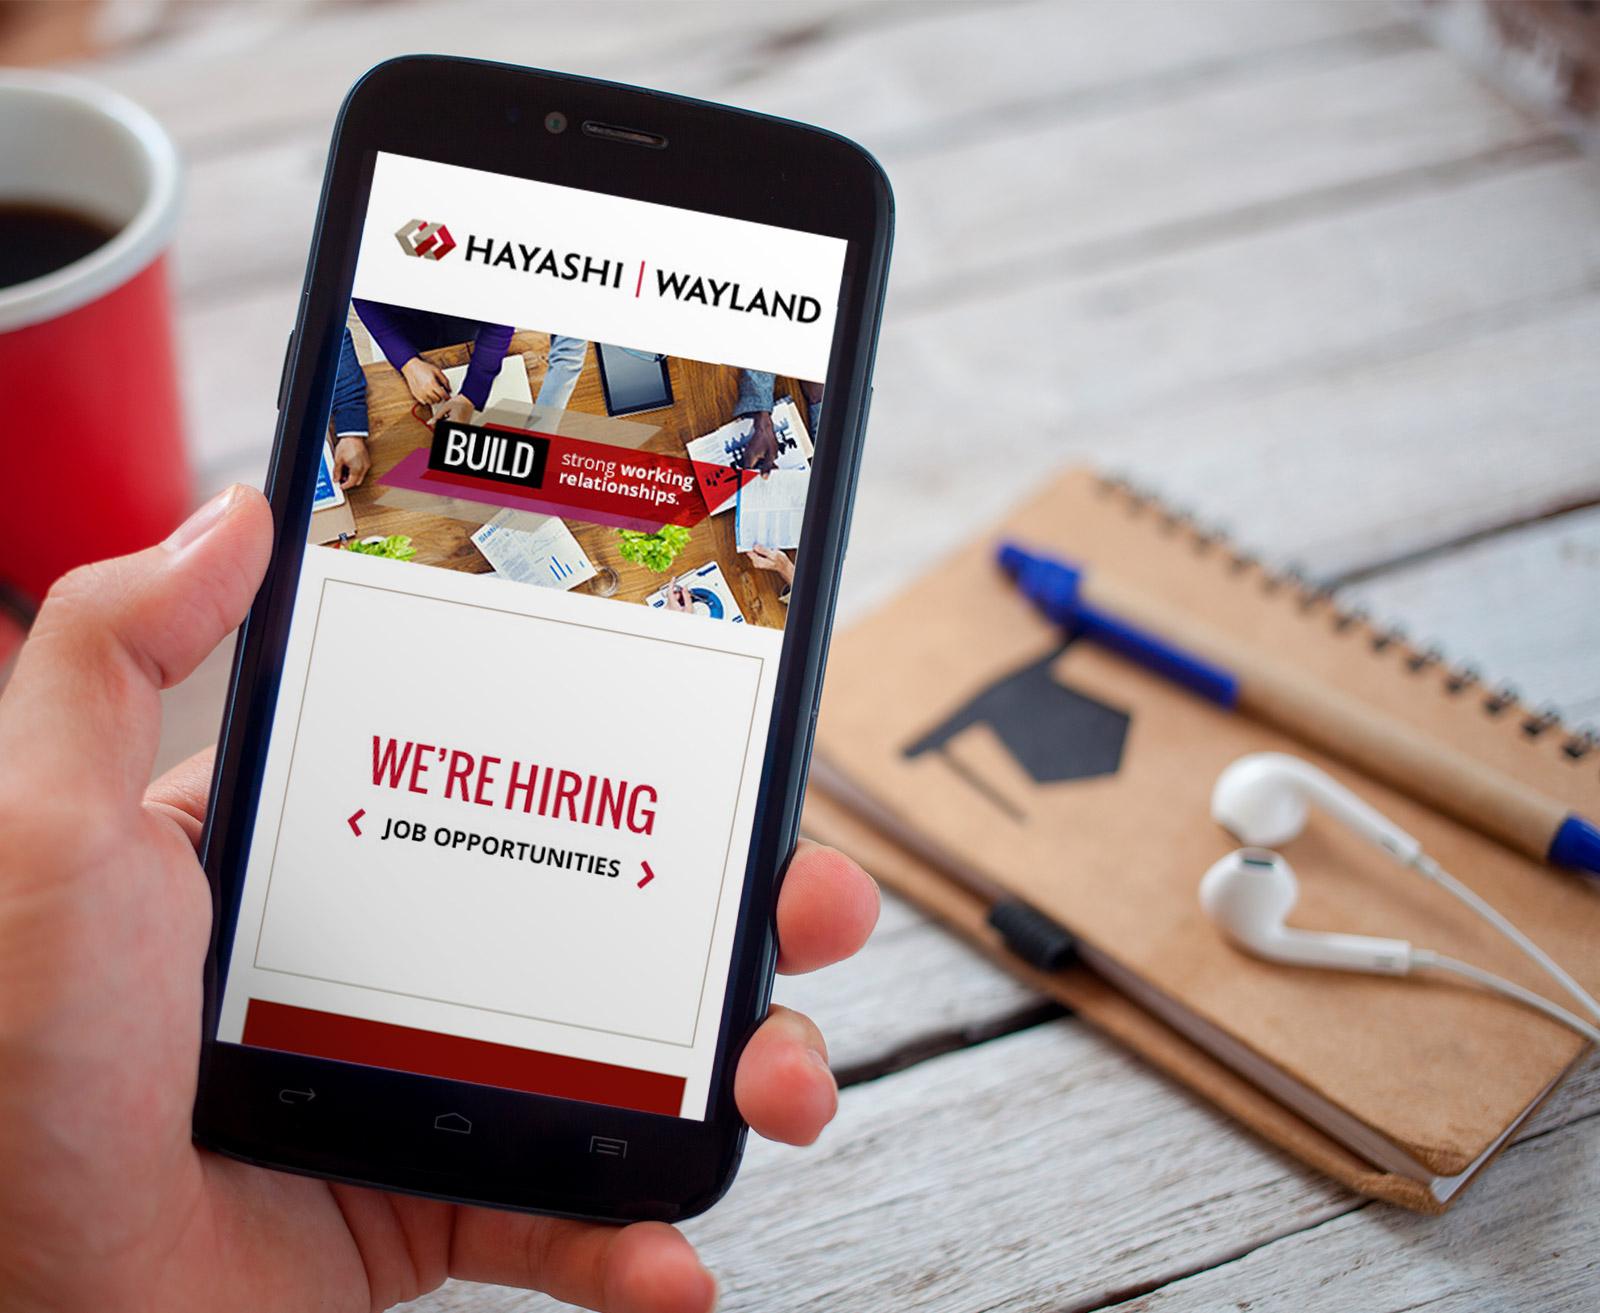 Hayashi Wayland Website Mobile Responsive Design